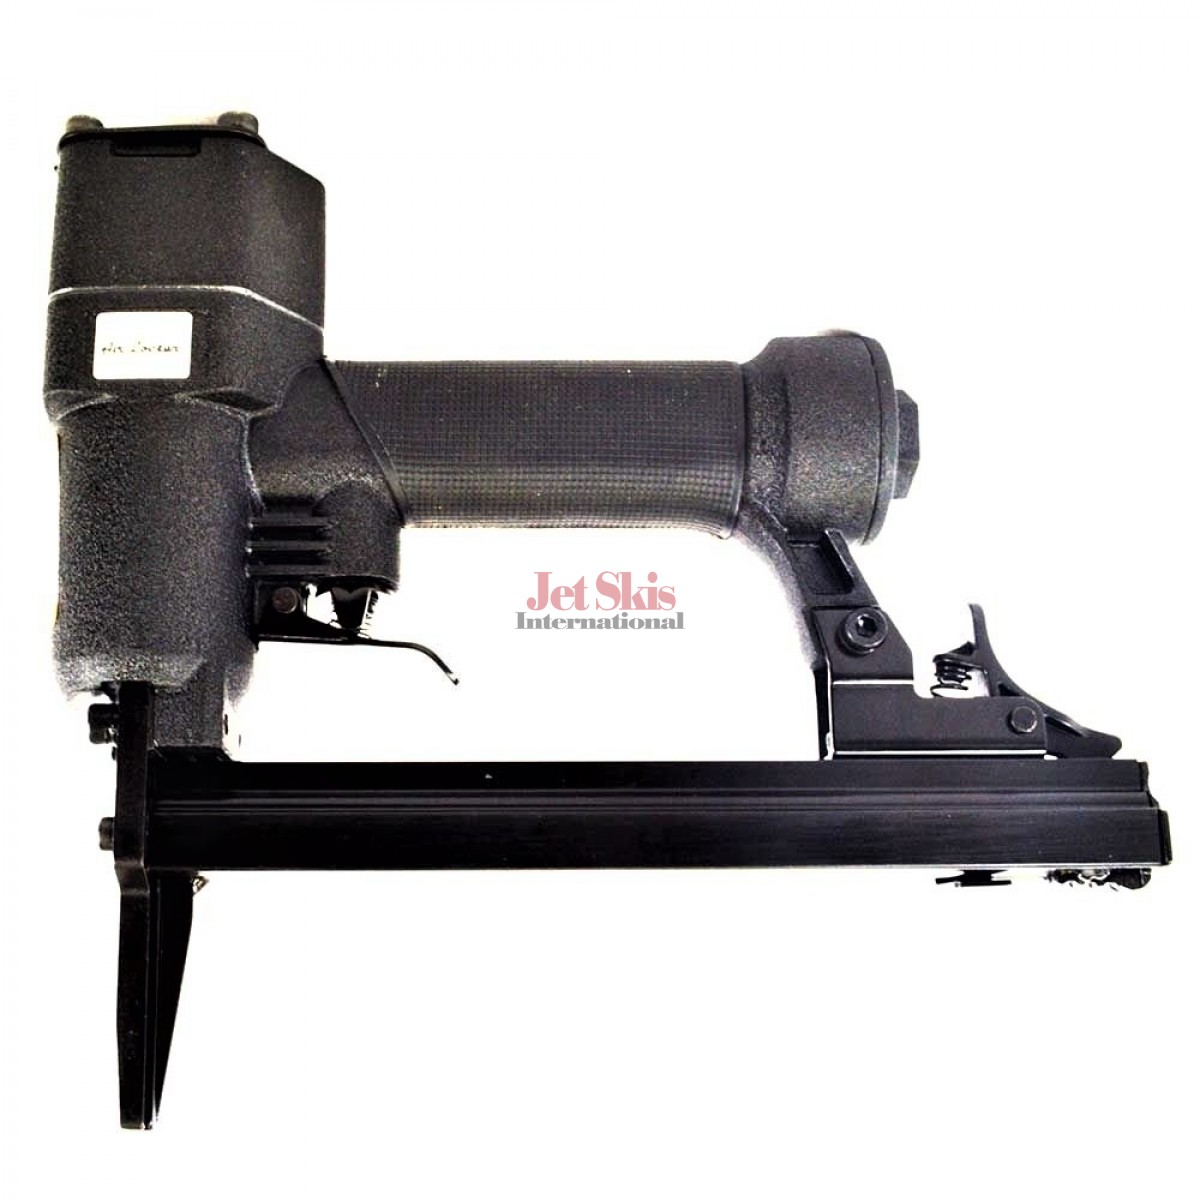 U630L2 Long Nose Pneumatic Staple Gun